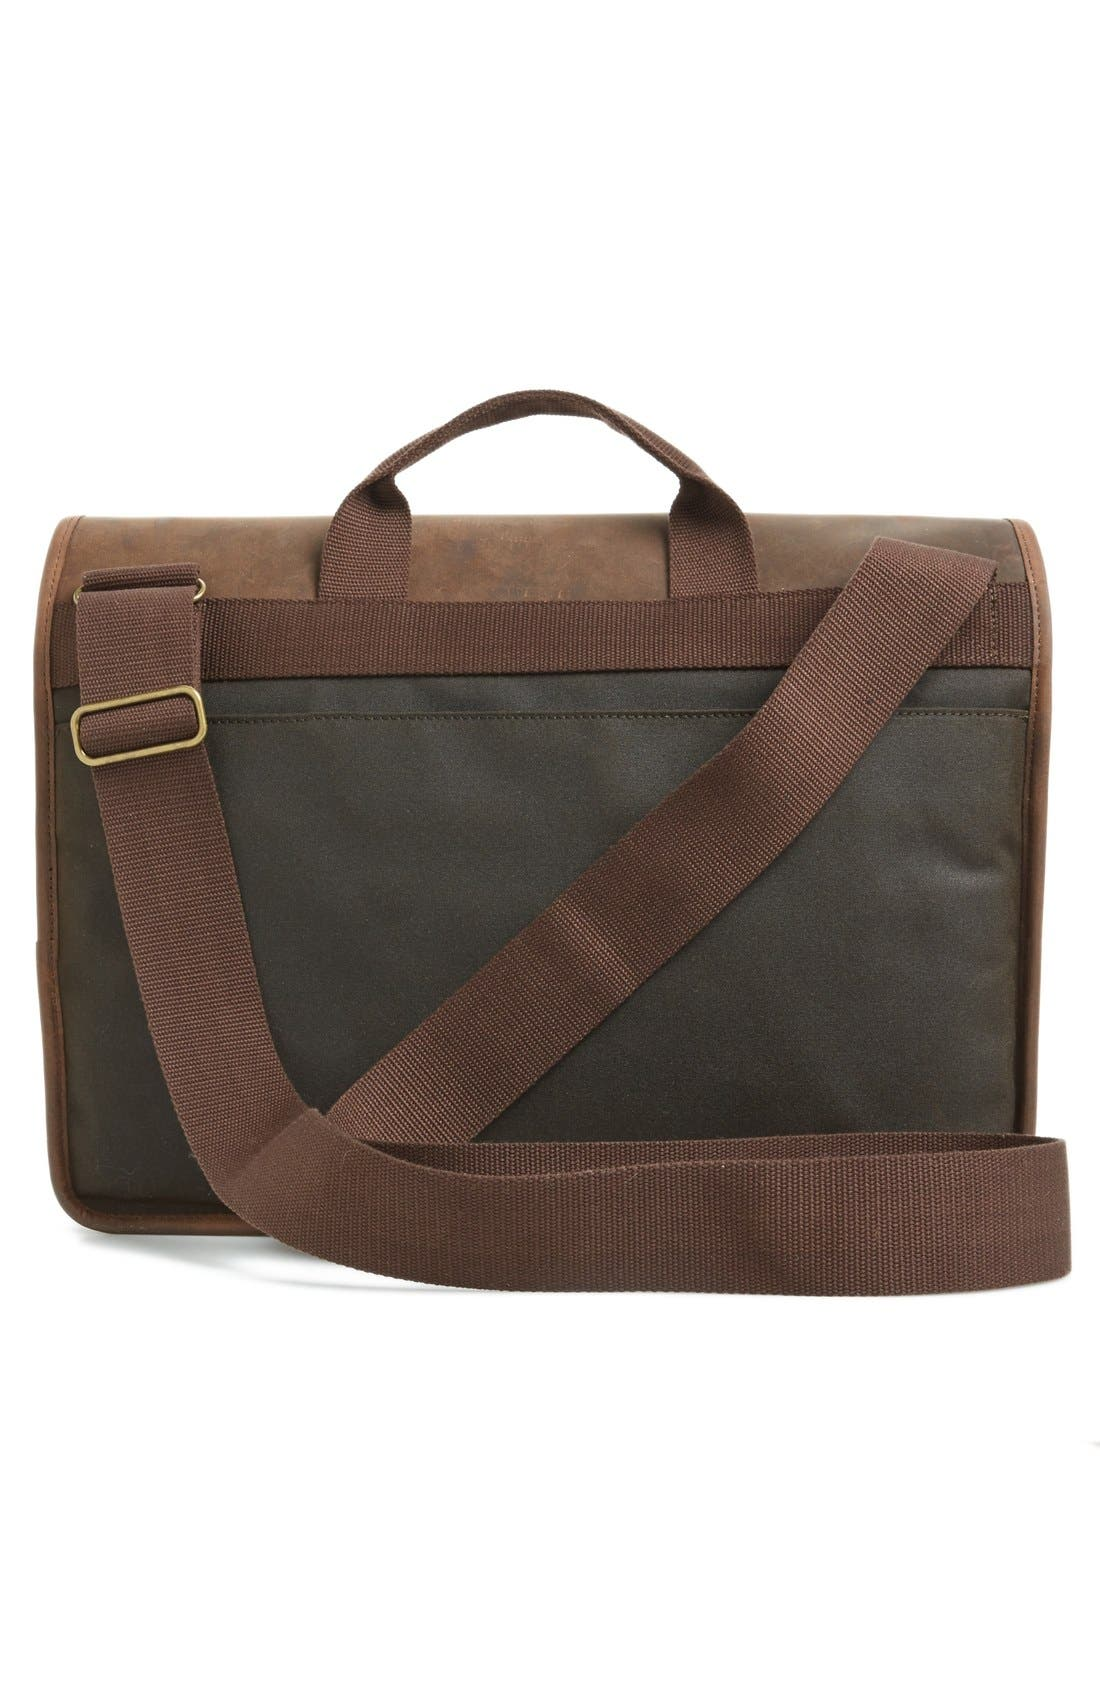 BARBOUR,                             Waxed Canvas & Leather Messenger Bag,                             Alternate thumbnail 3, color,                             340